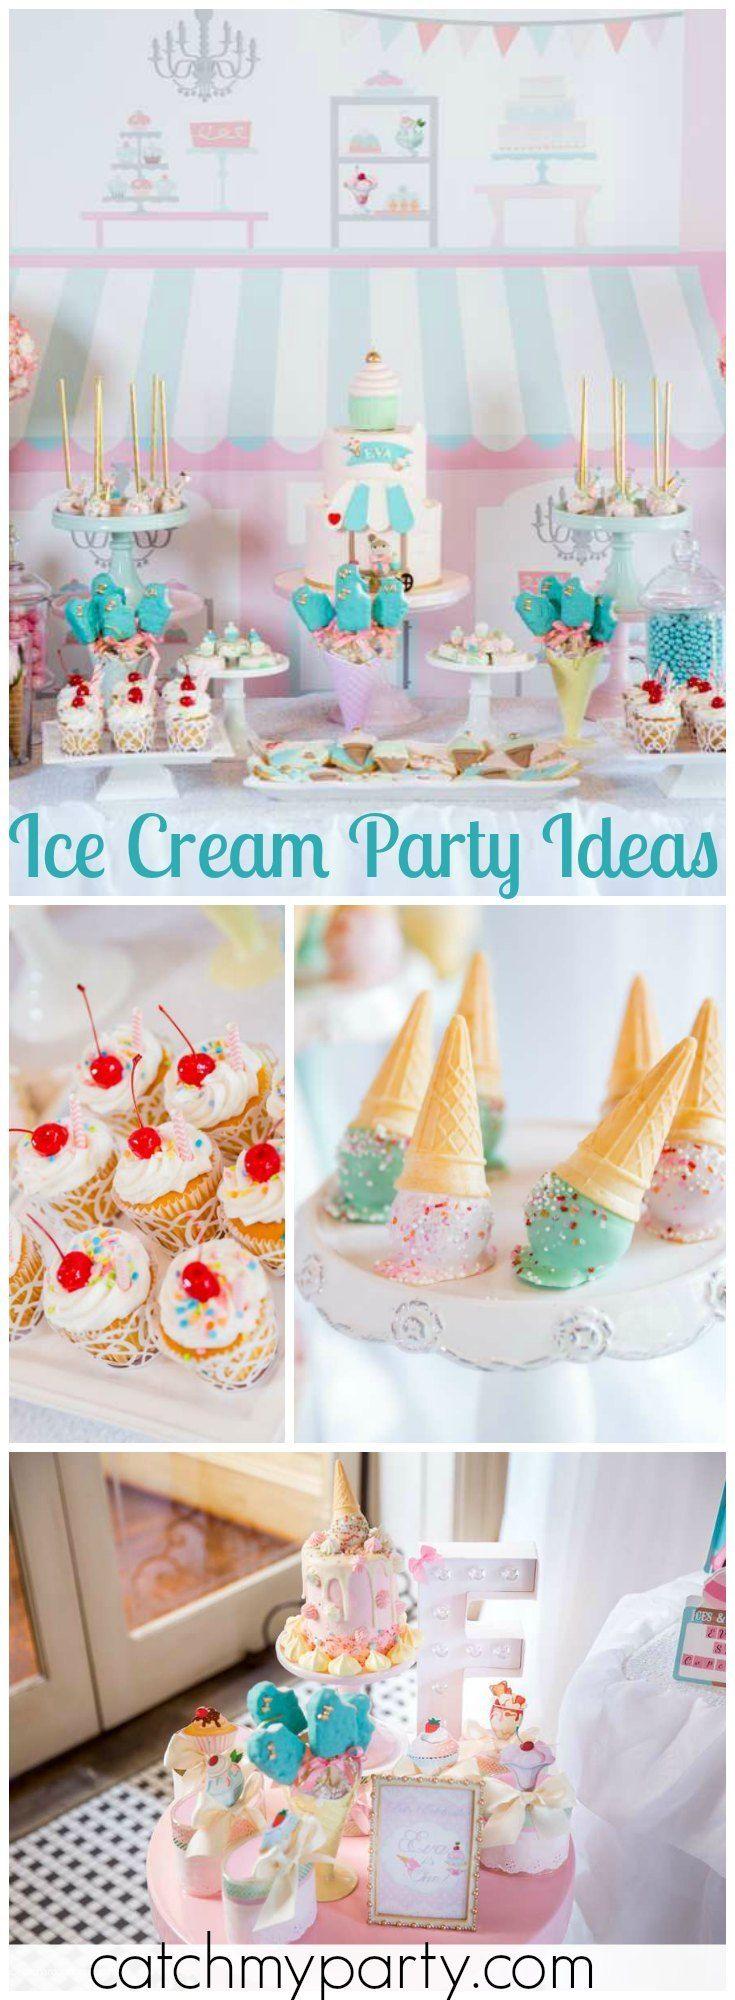 417 best Ice Cream Party Ideas images on Pinterest | Birthdays ...